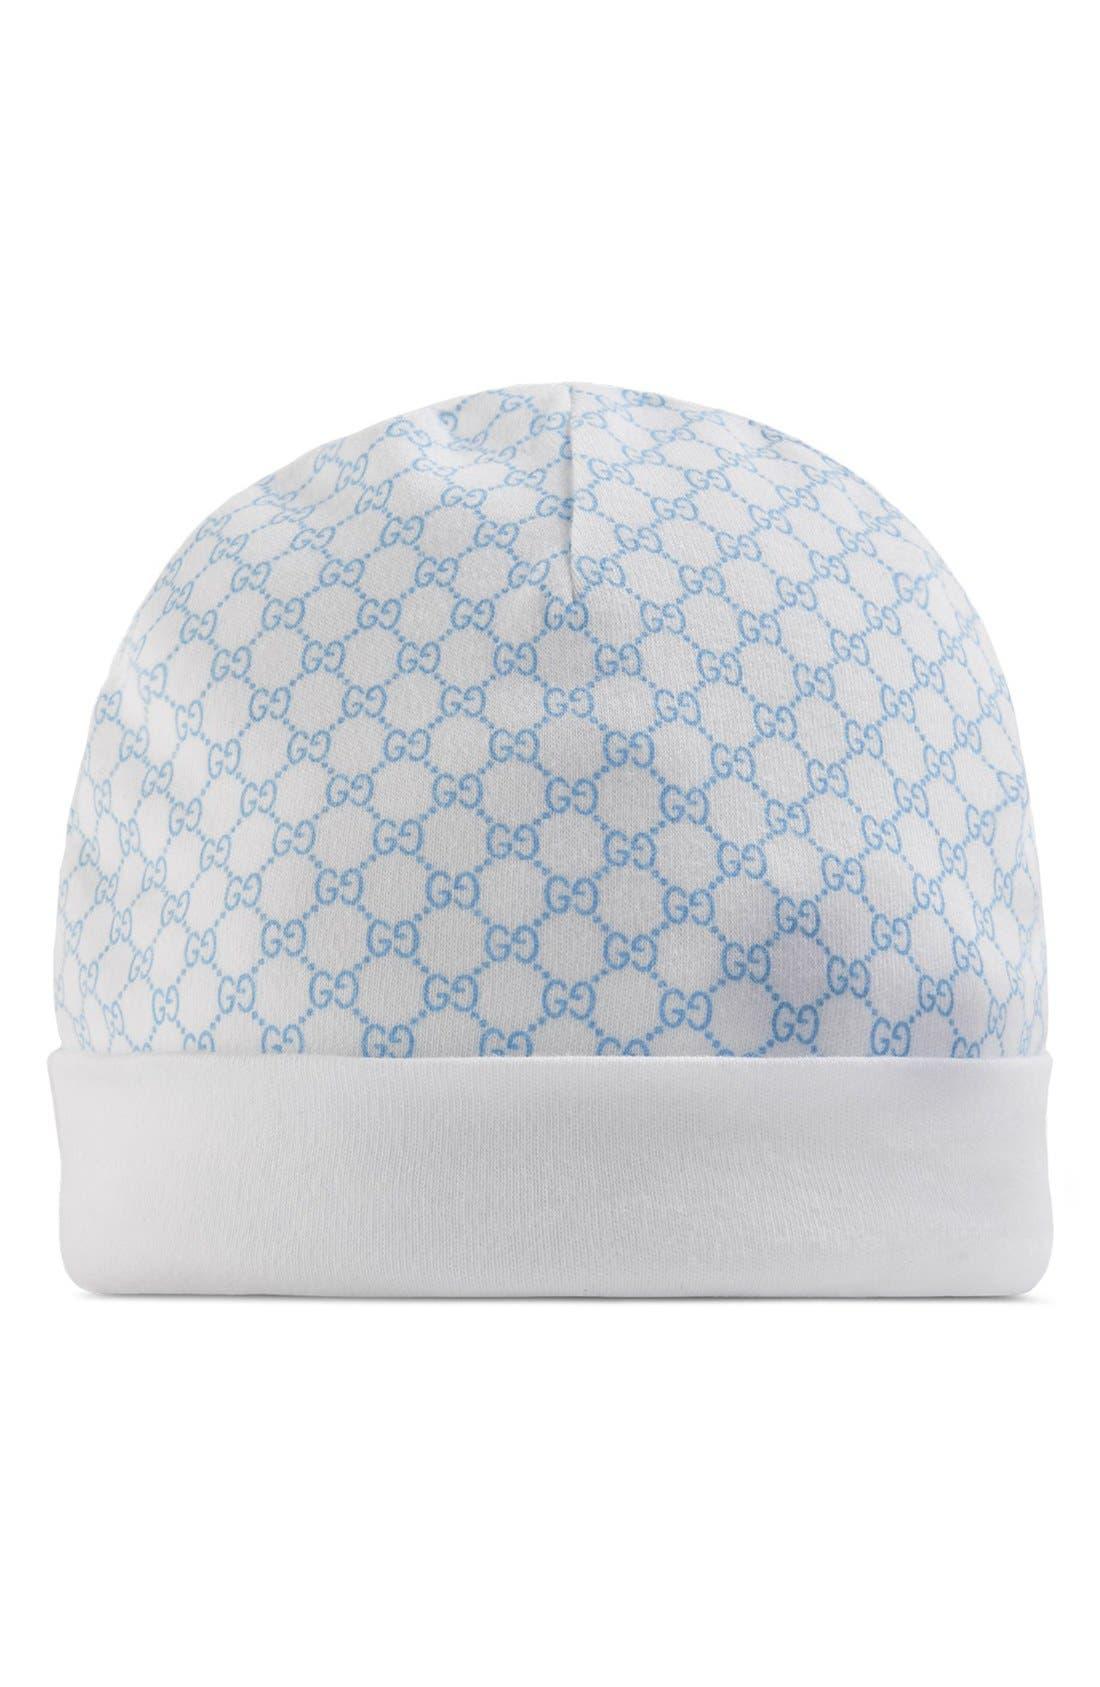 Logo Knit Hat,                         Main,                         color, Ivory/ Sky Blue